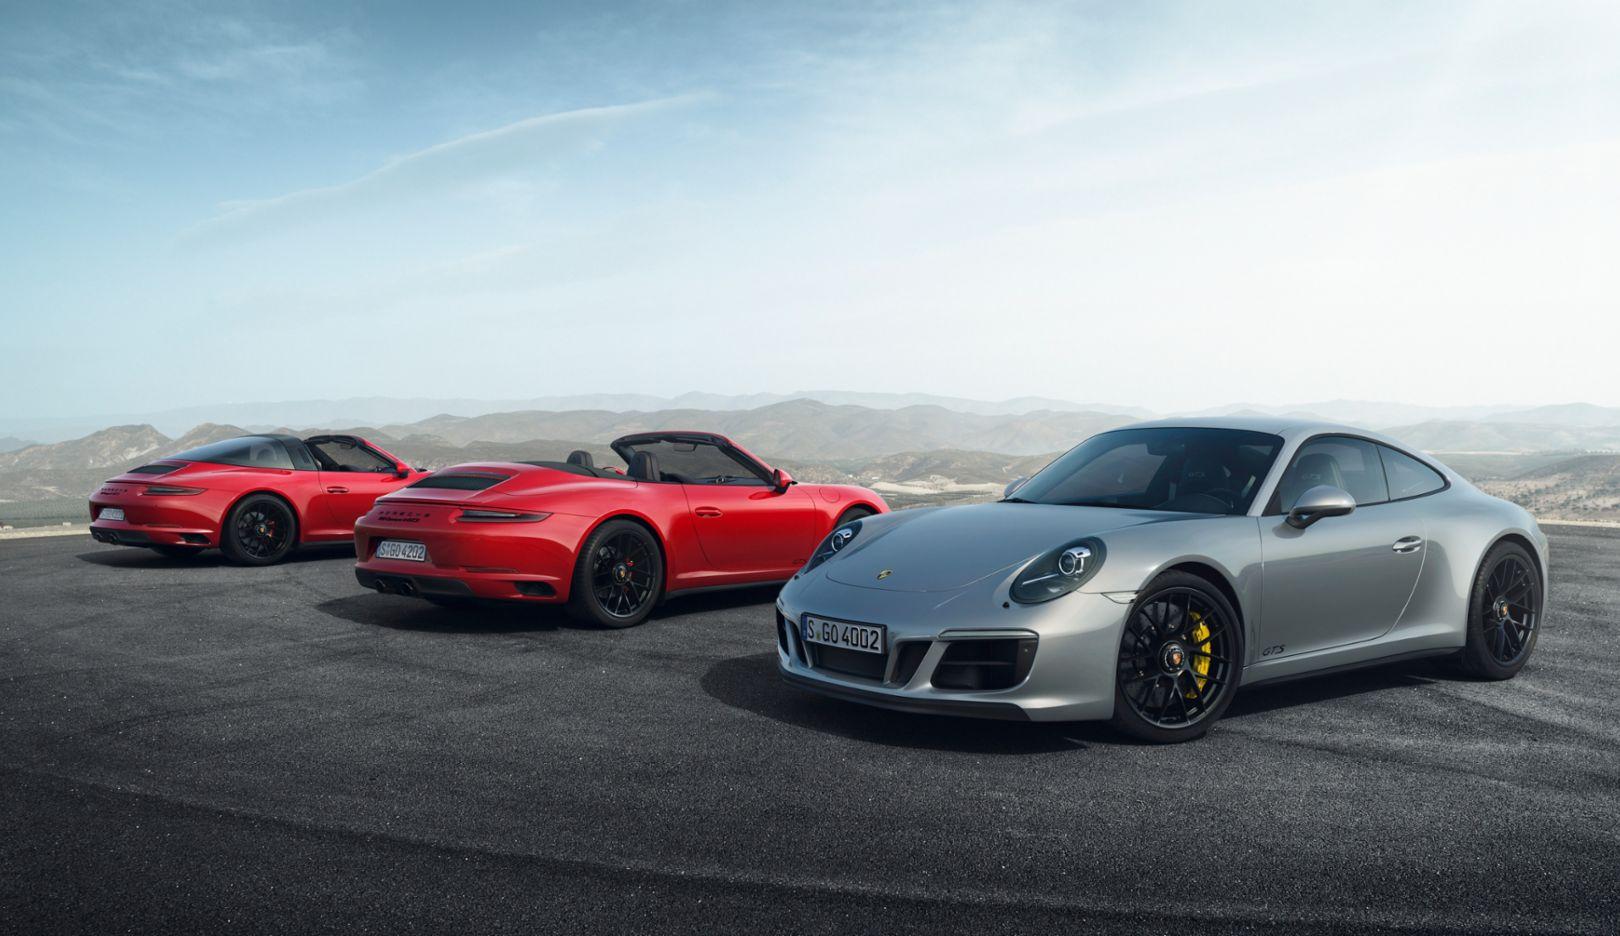 The New 911 Gts Models